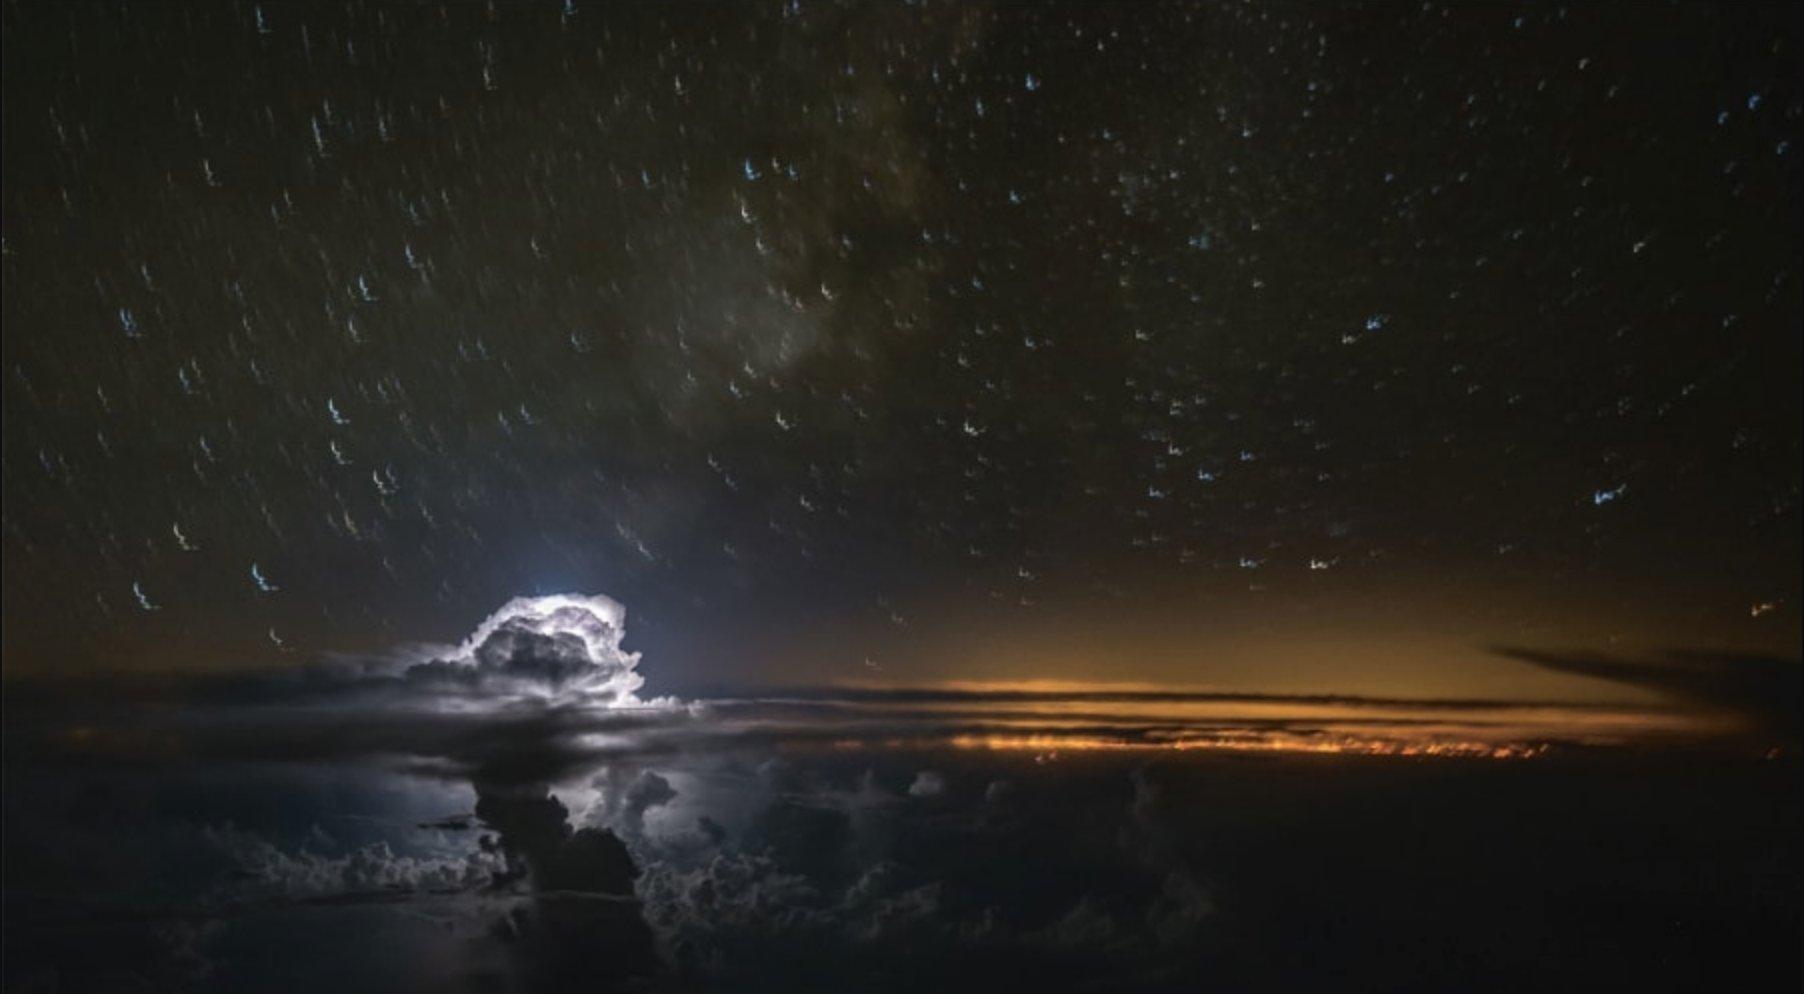 This pilot photographs storms from the airplane cockpit https://t.co/u9KpDRMV20 https://t.co/Fh1l9IjHpf